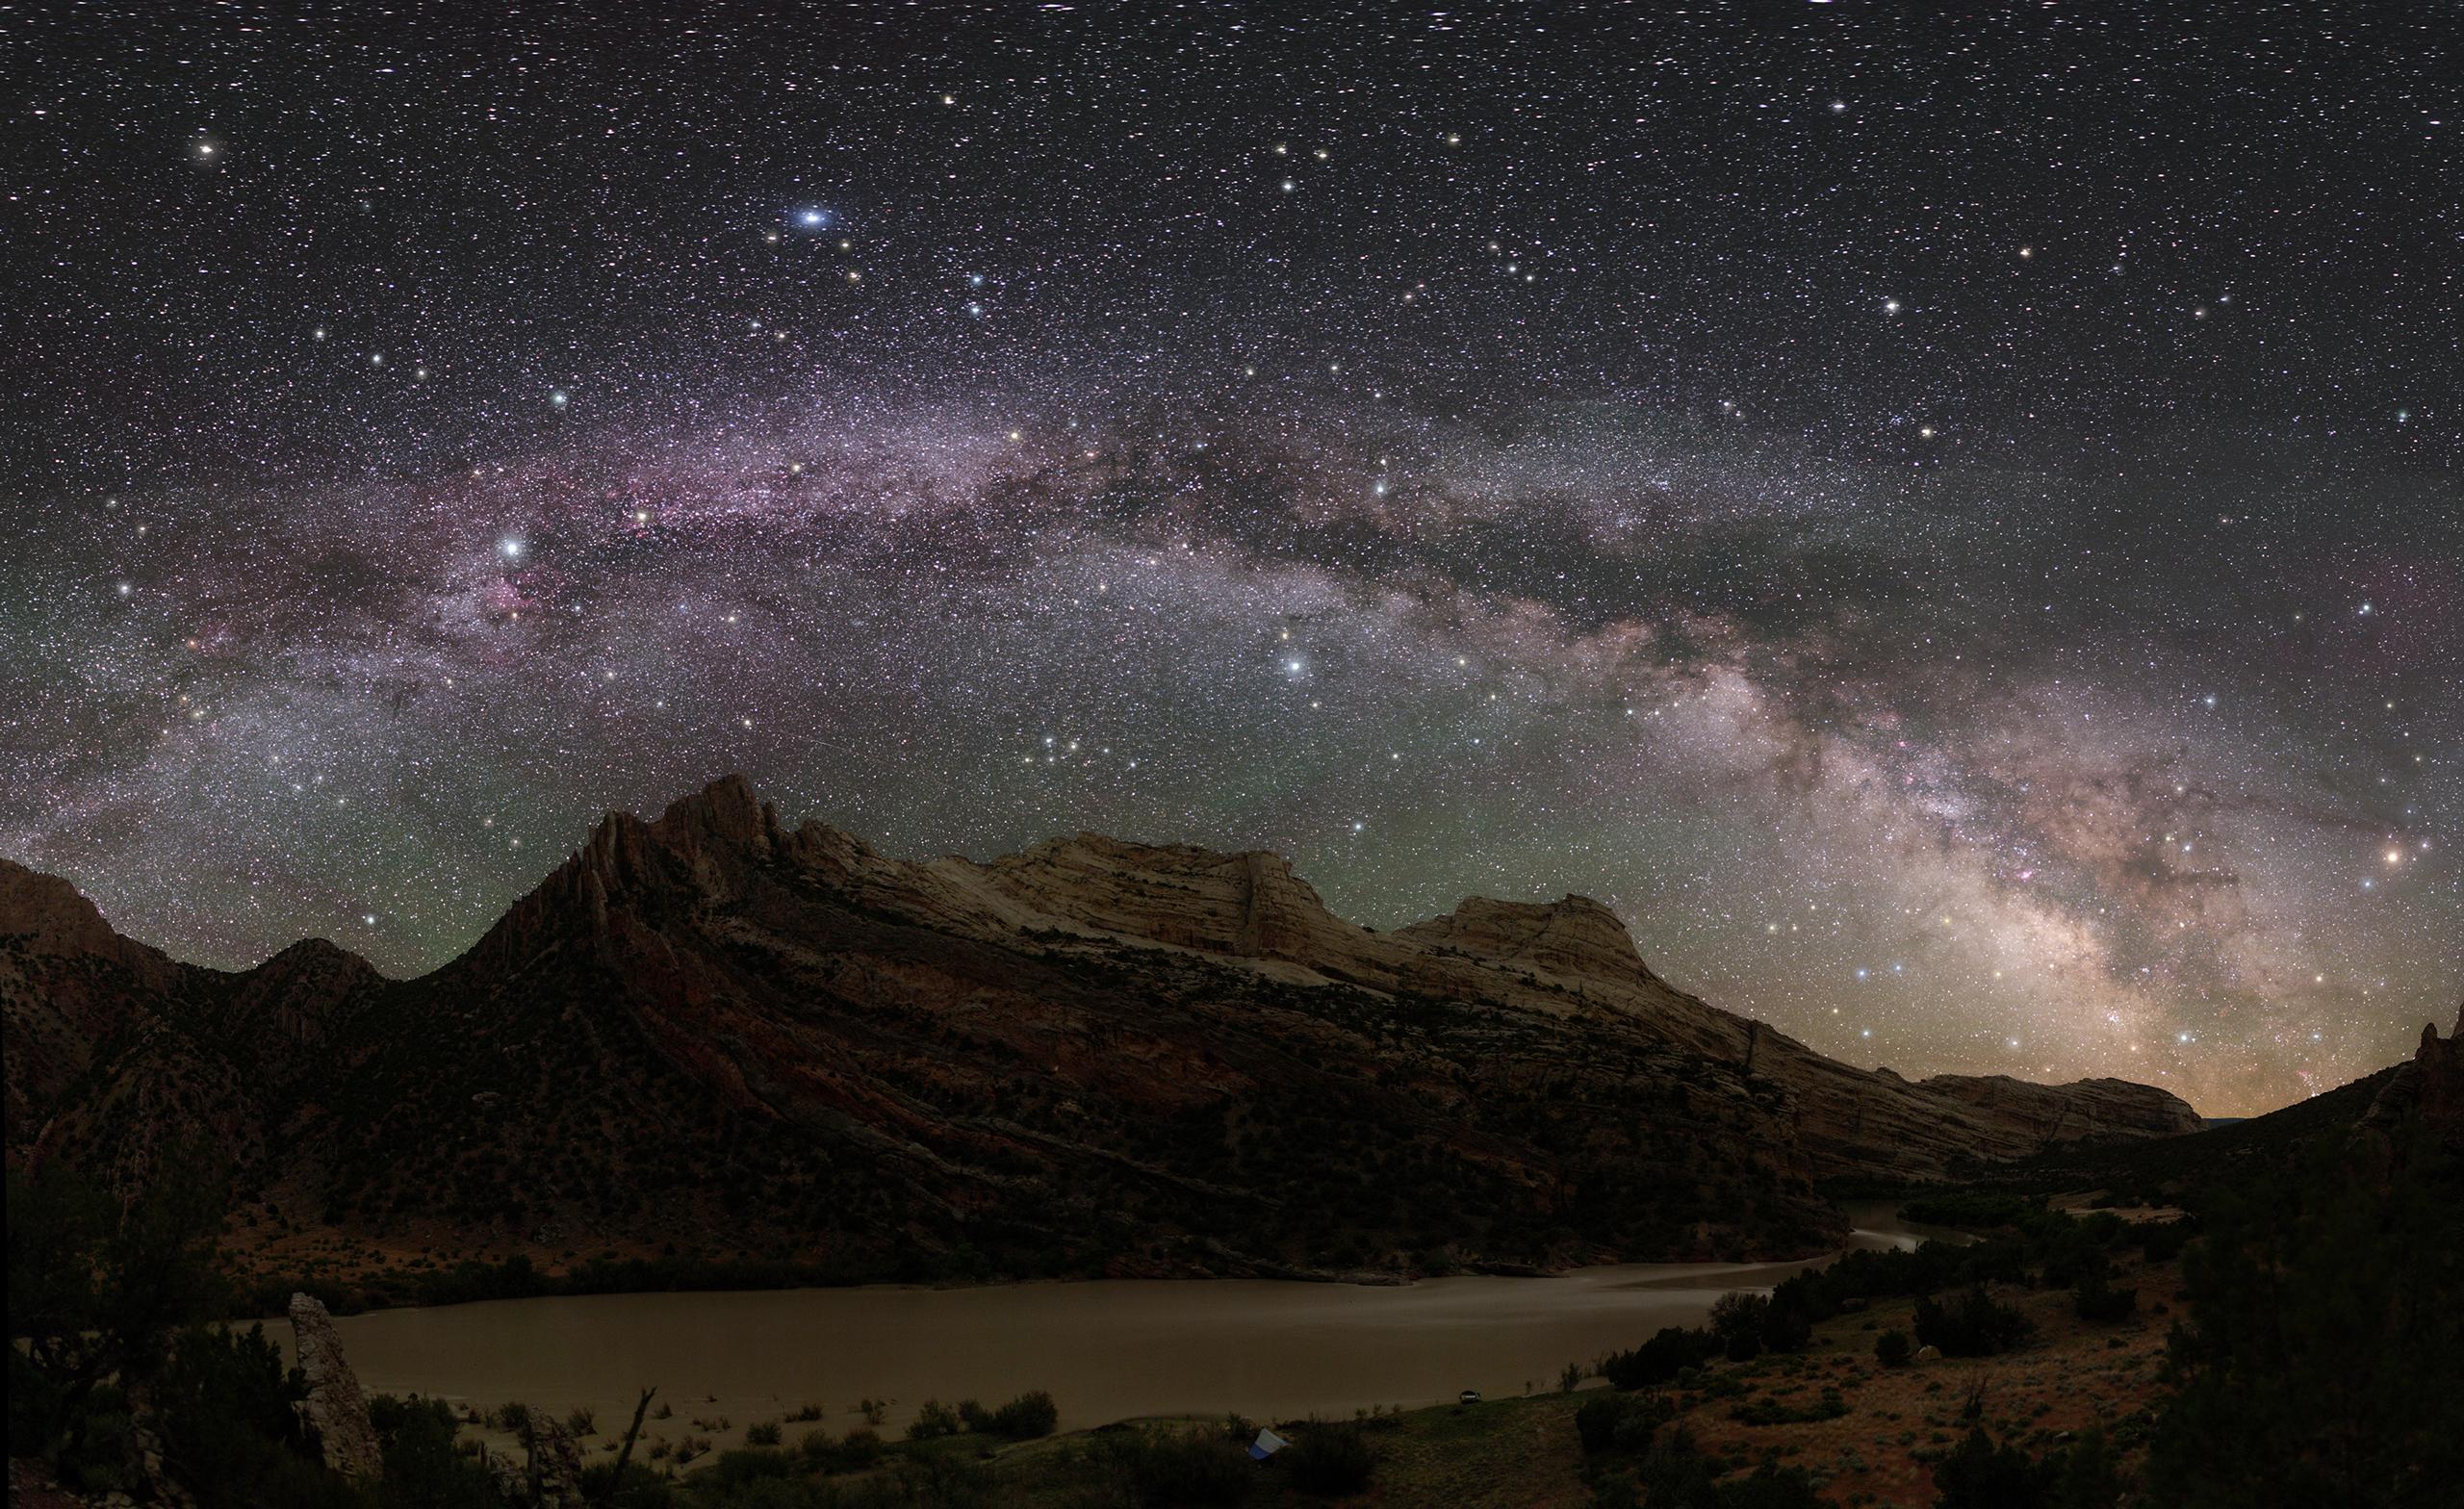 The Milky Way over Dinosaur National Park.